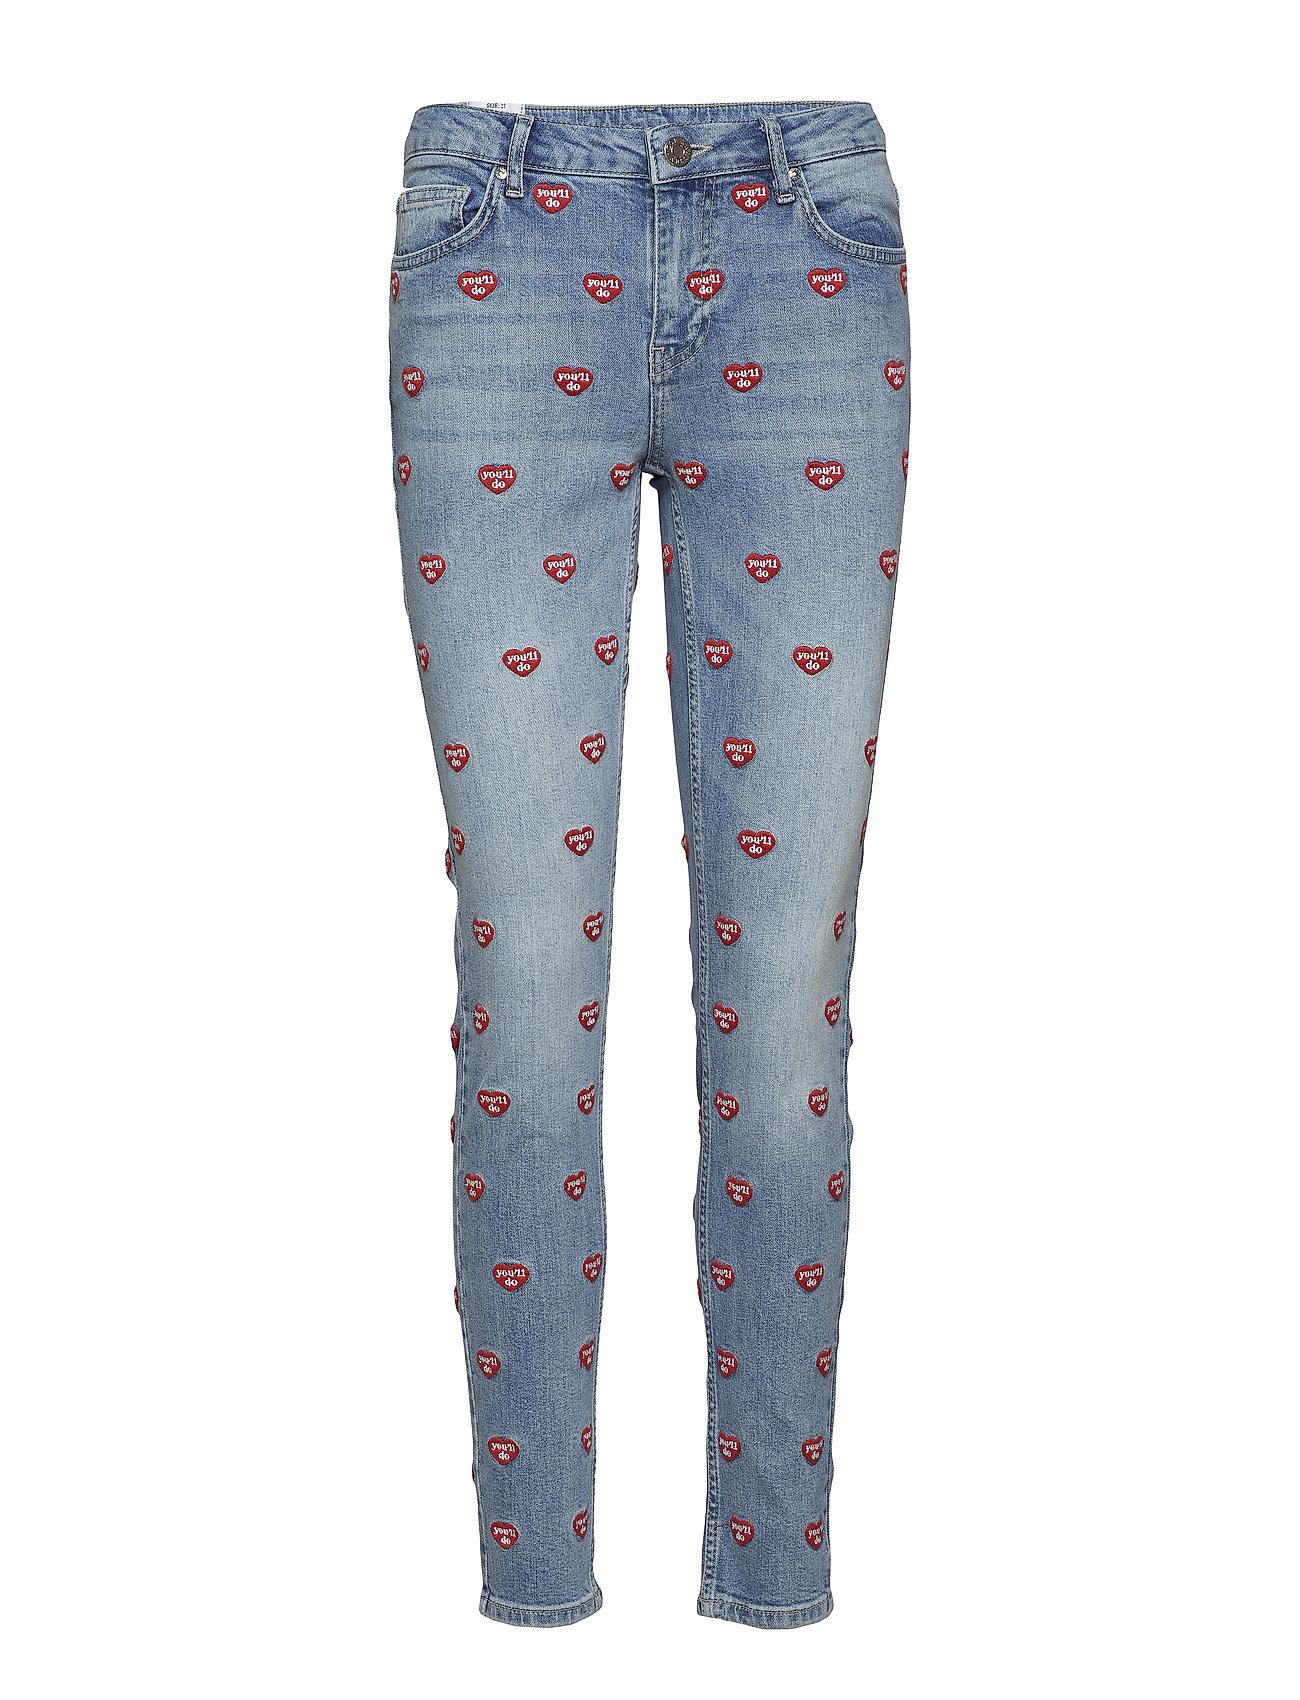 Zoe Karssen PATTI' SKINNY Jeans